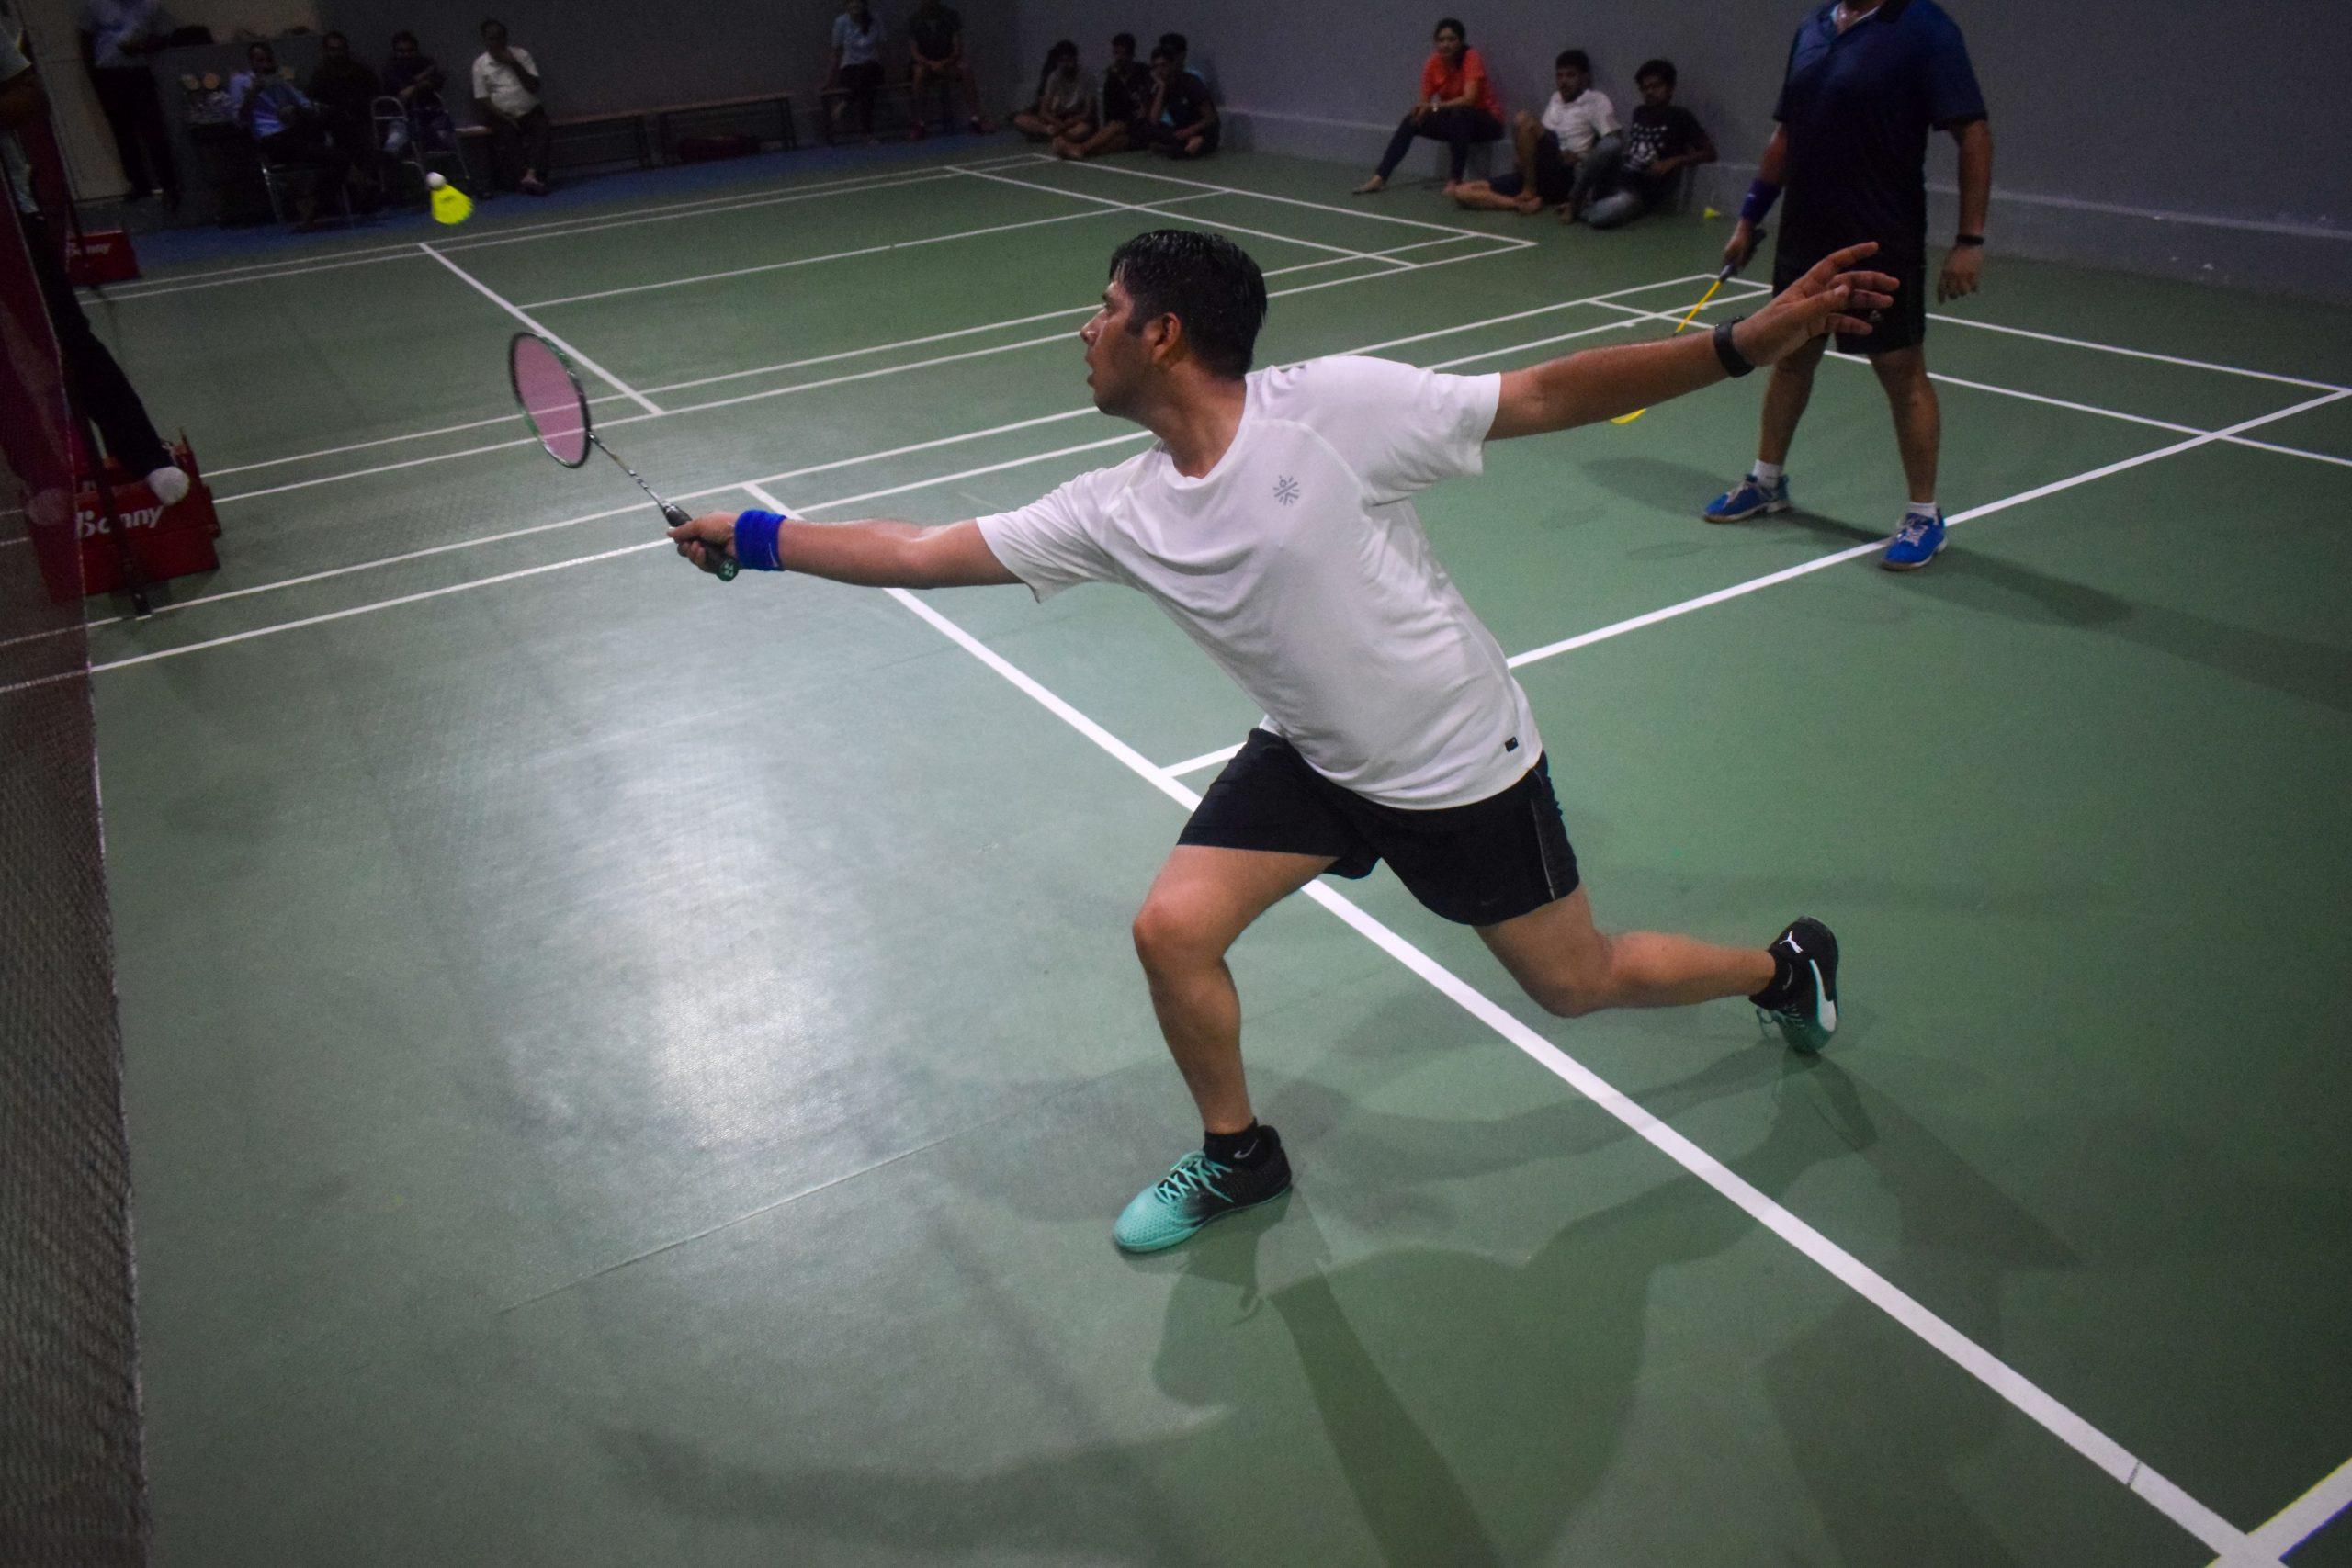 A man playing badminton.